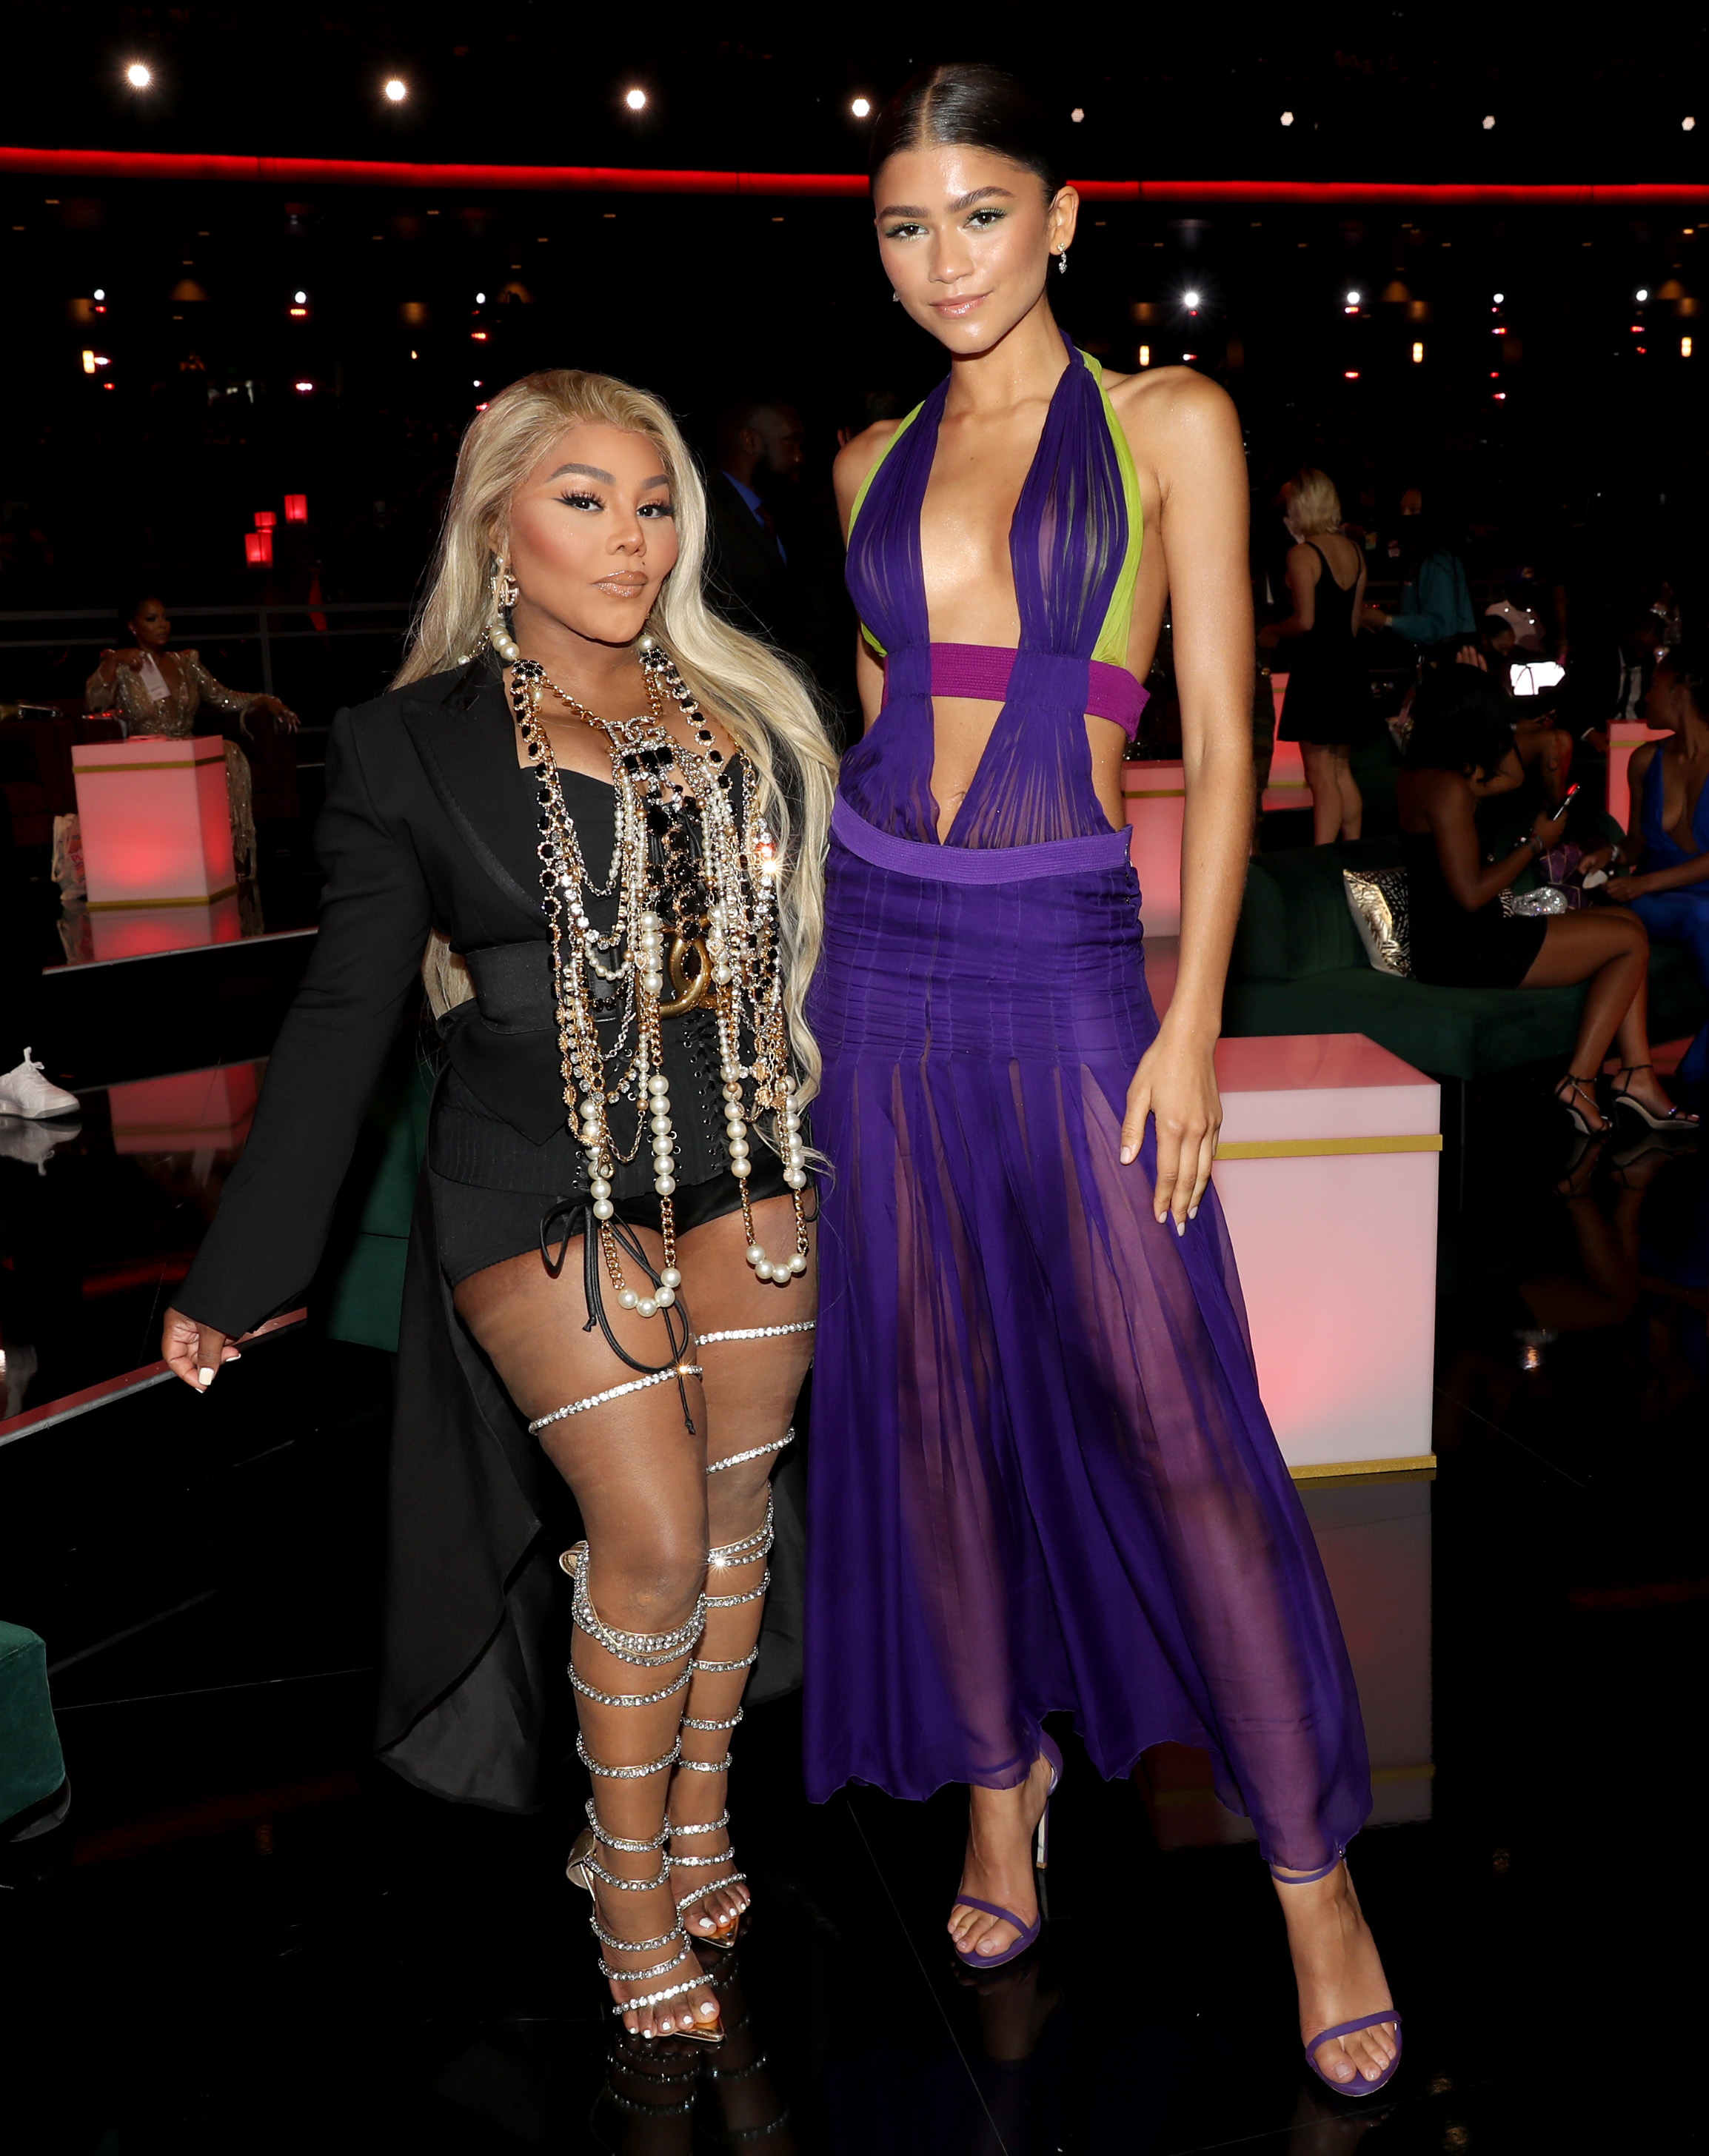 Lil' Kim and Zendaya